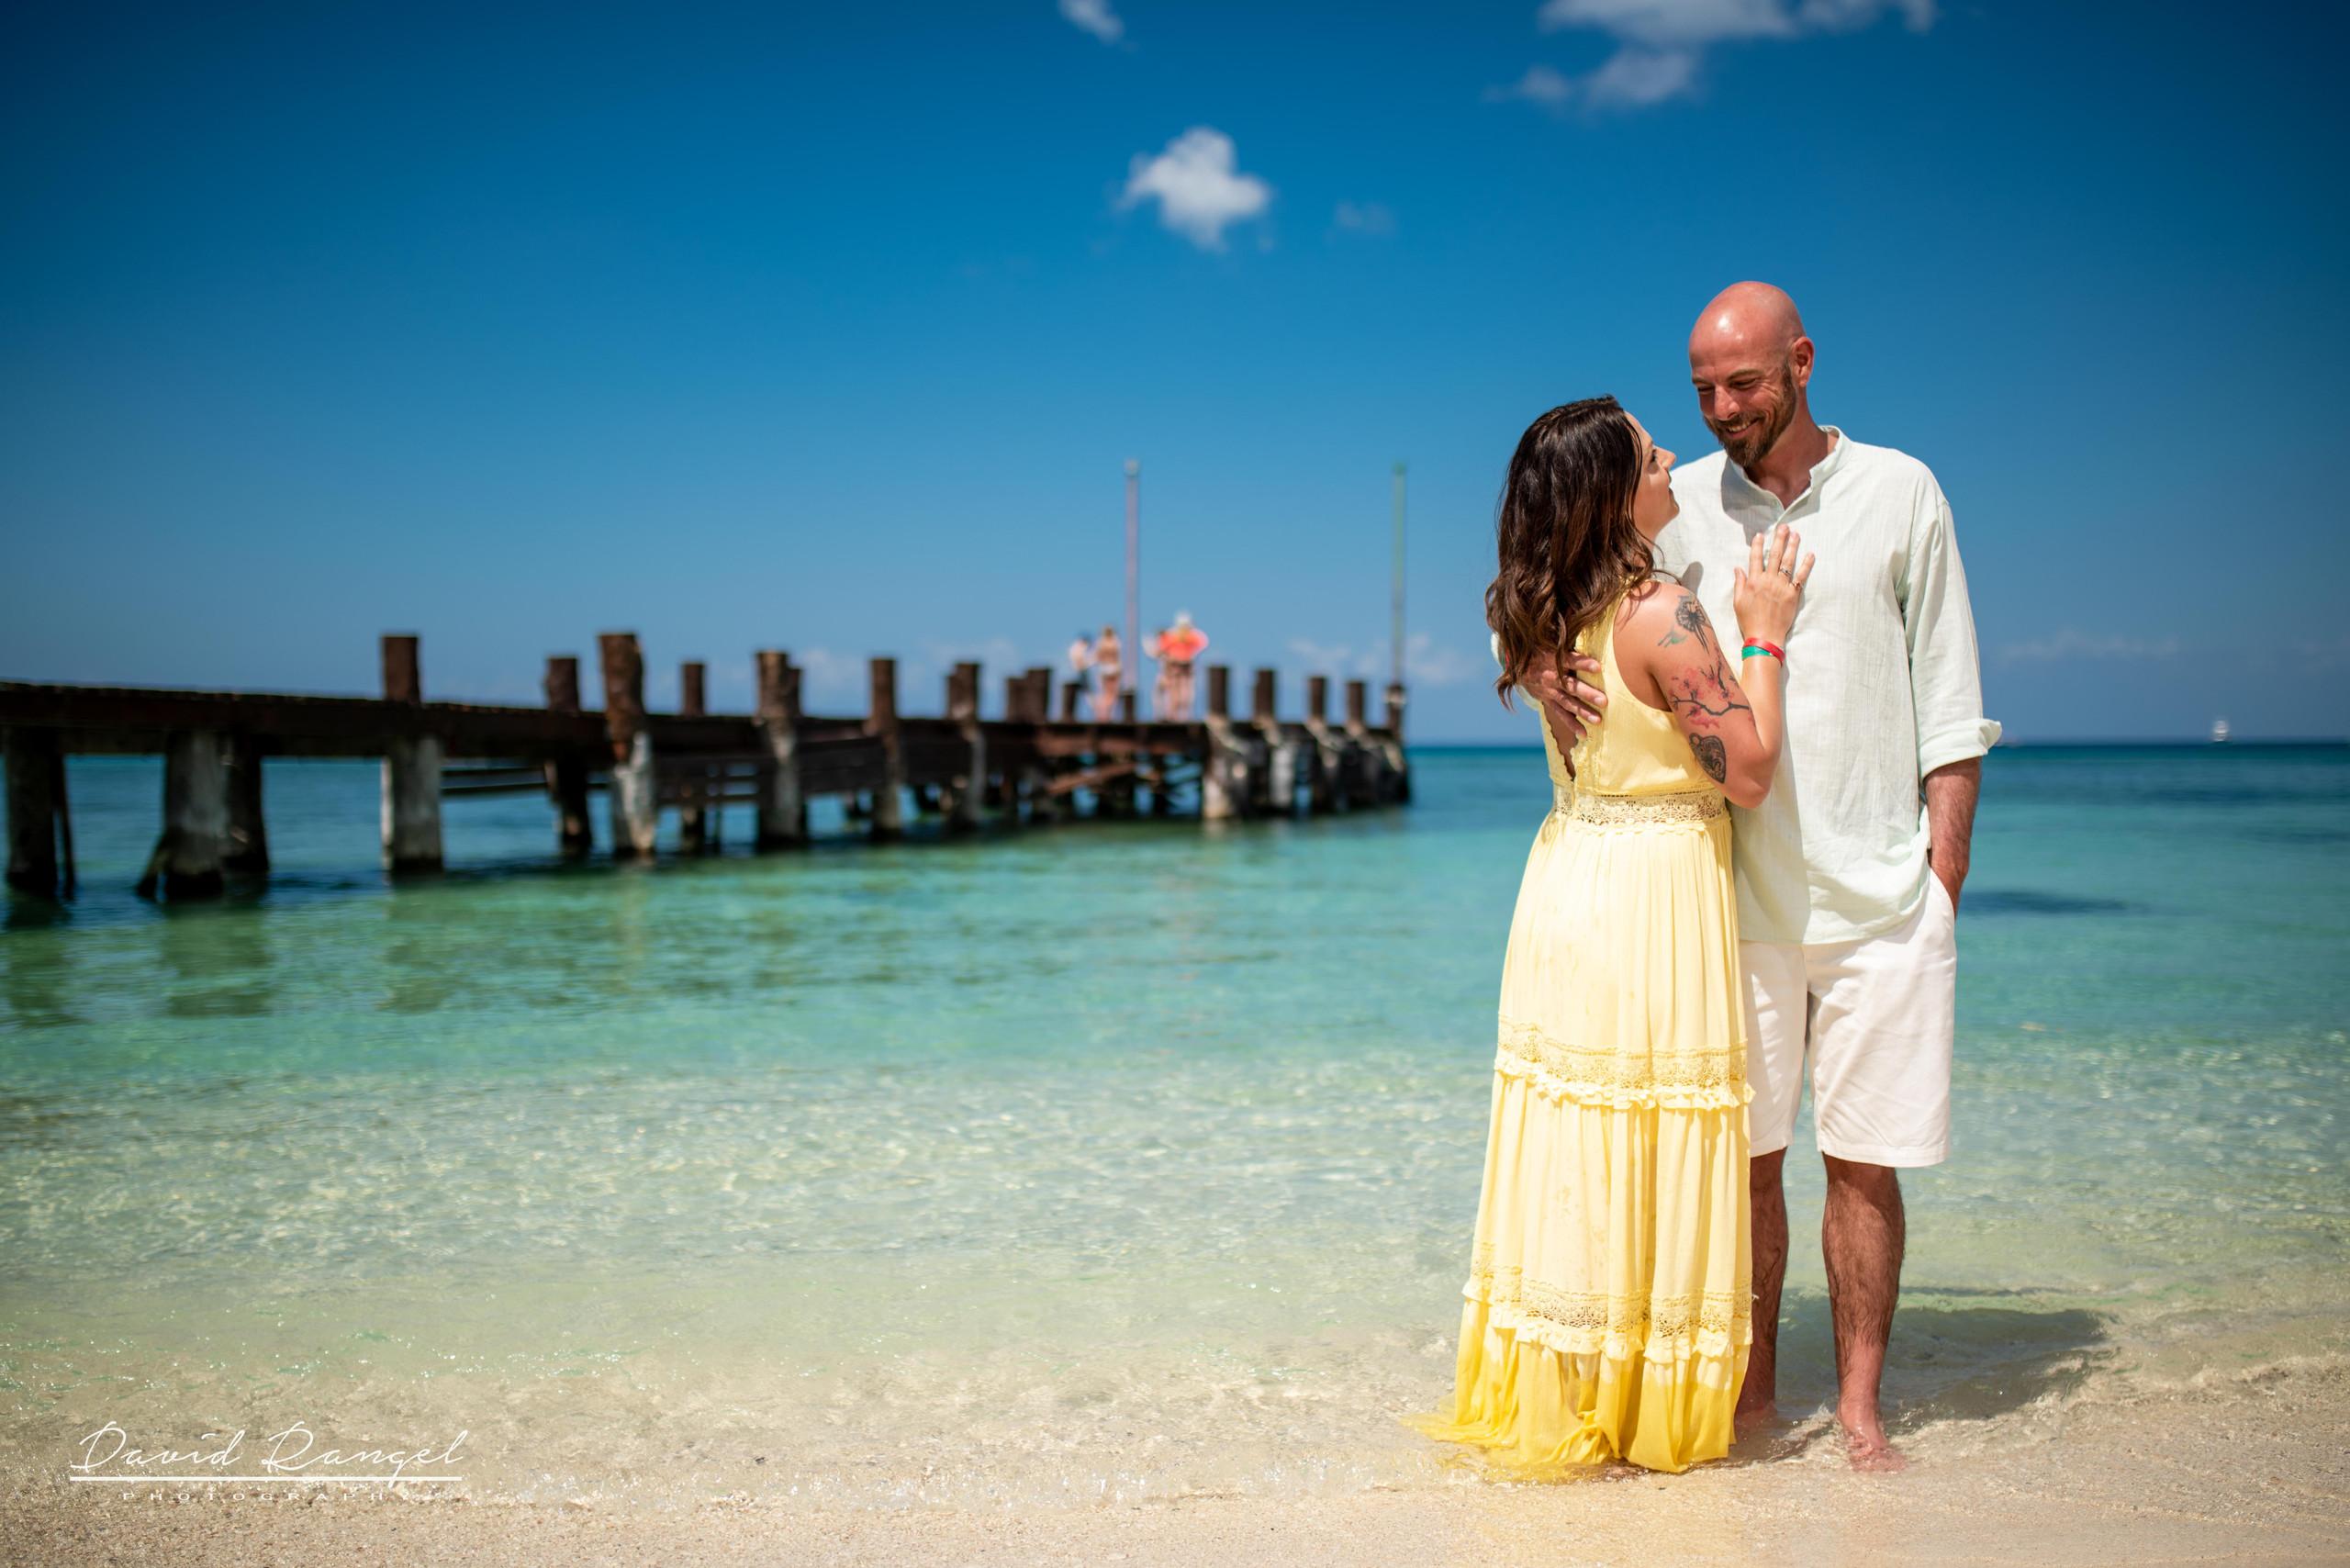 sand+session+beach+cozumel+island+photo+destination+photographer+couple+romantic+water+pier+paradise+happy